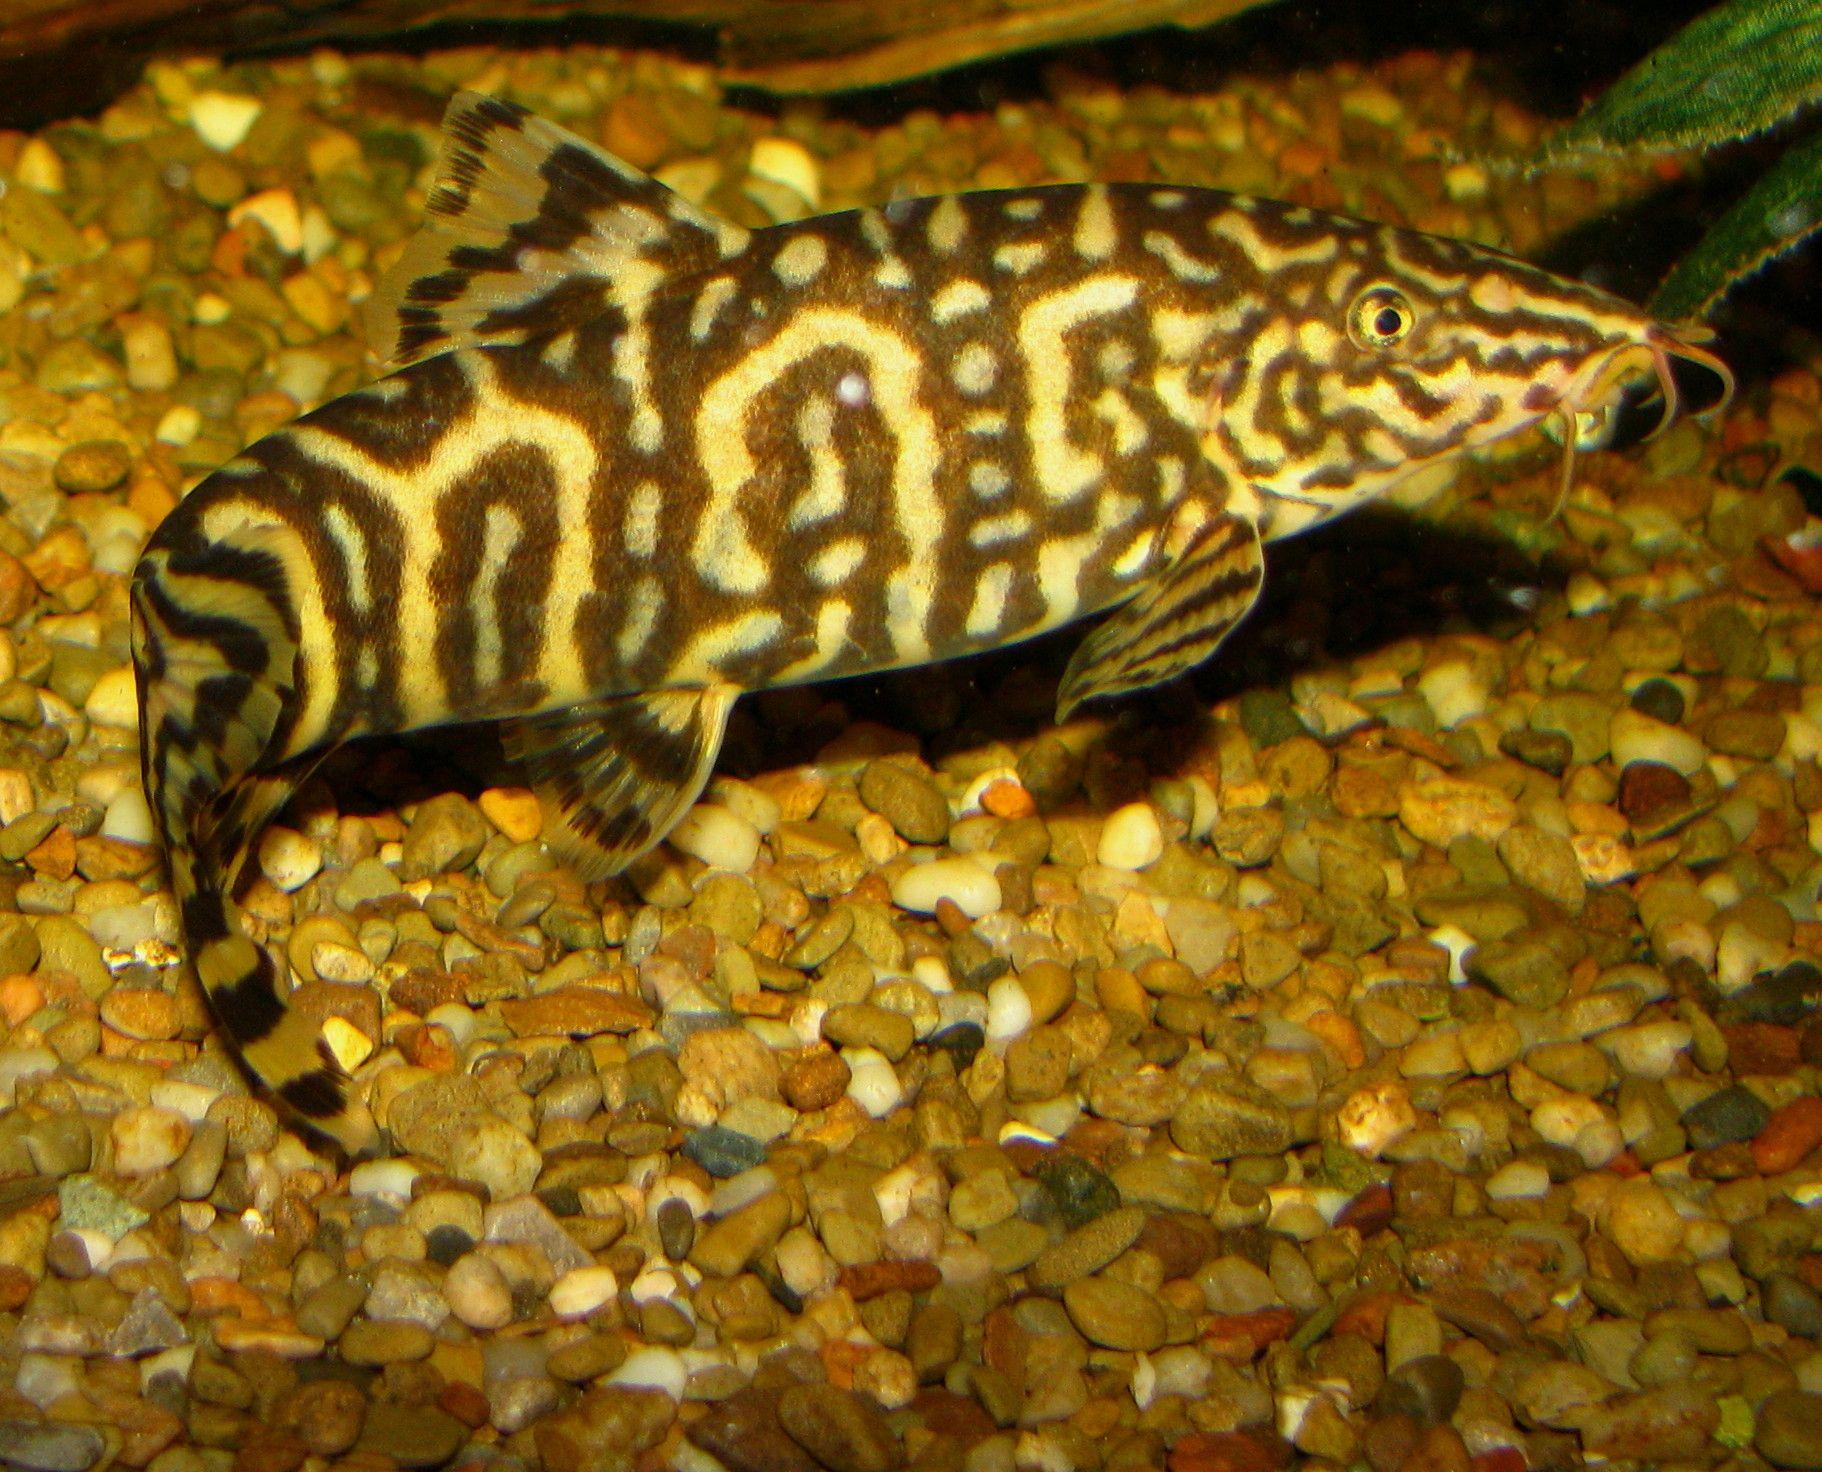 Yoyo Loach Yoyo Loach Cool Fish Aquarium Fish Fish Pet